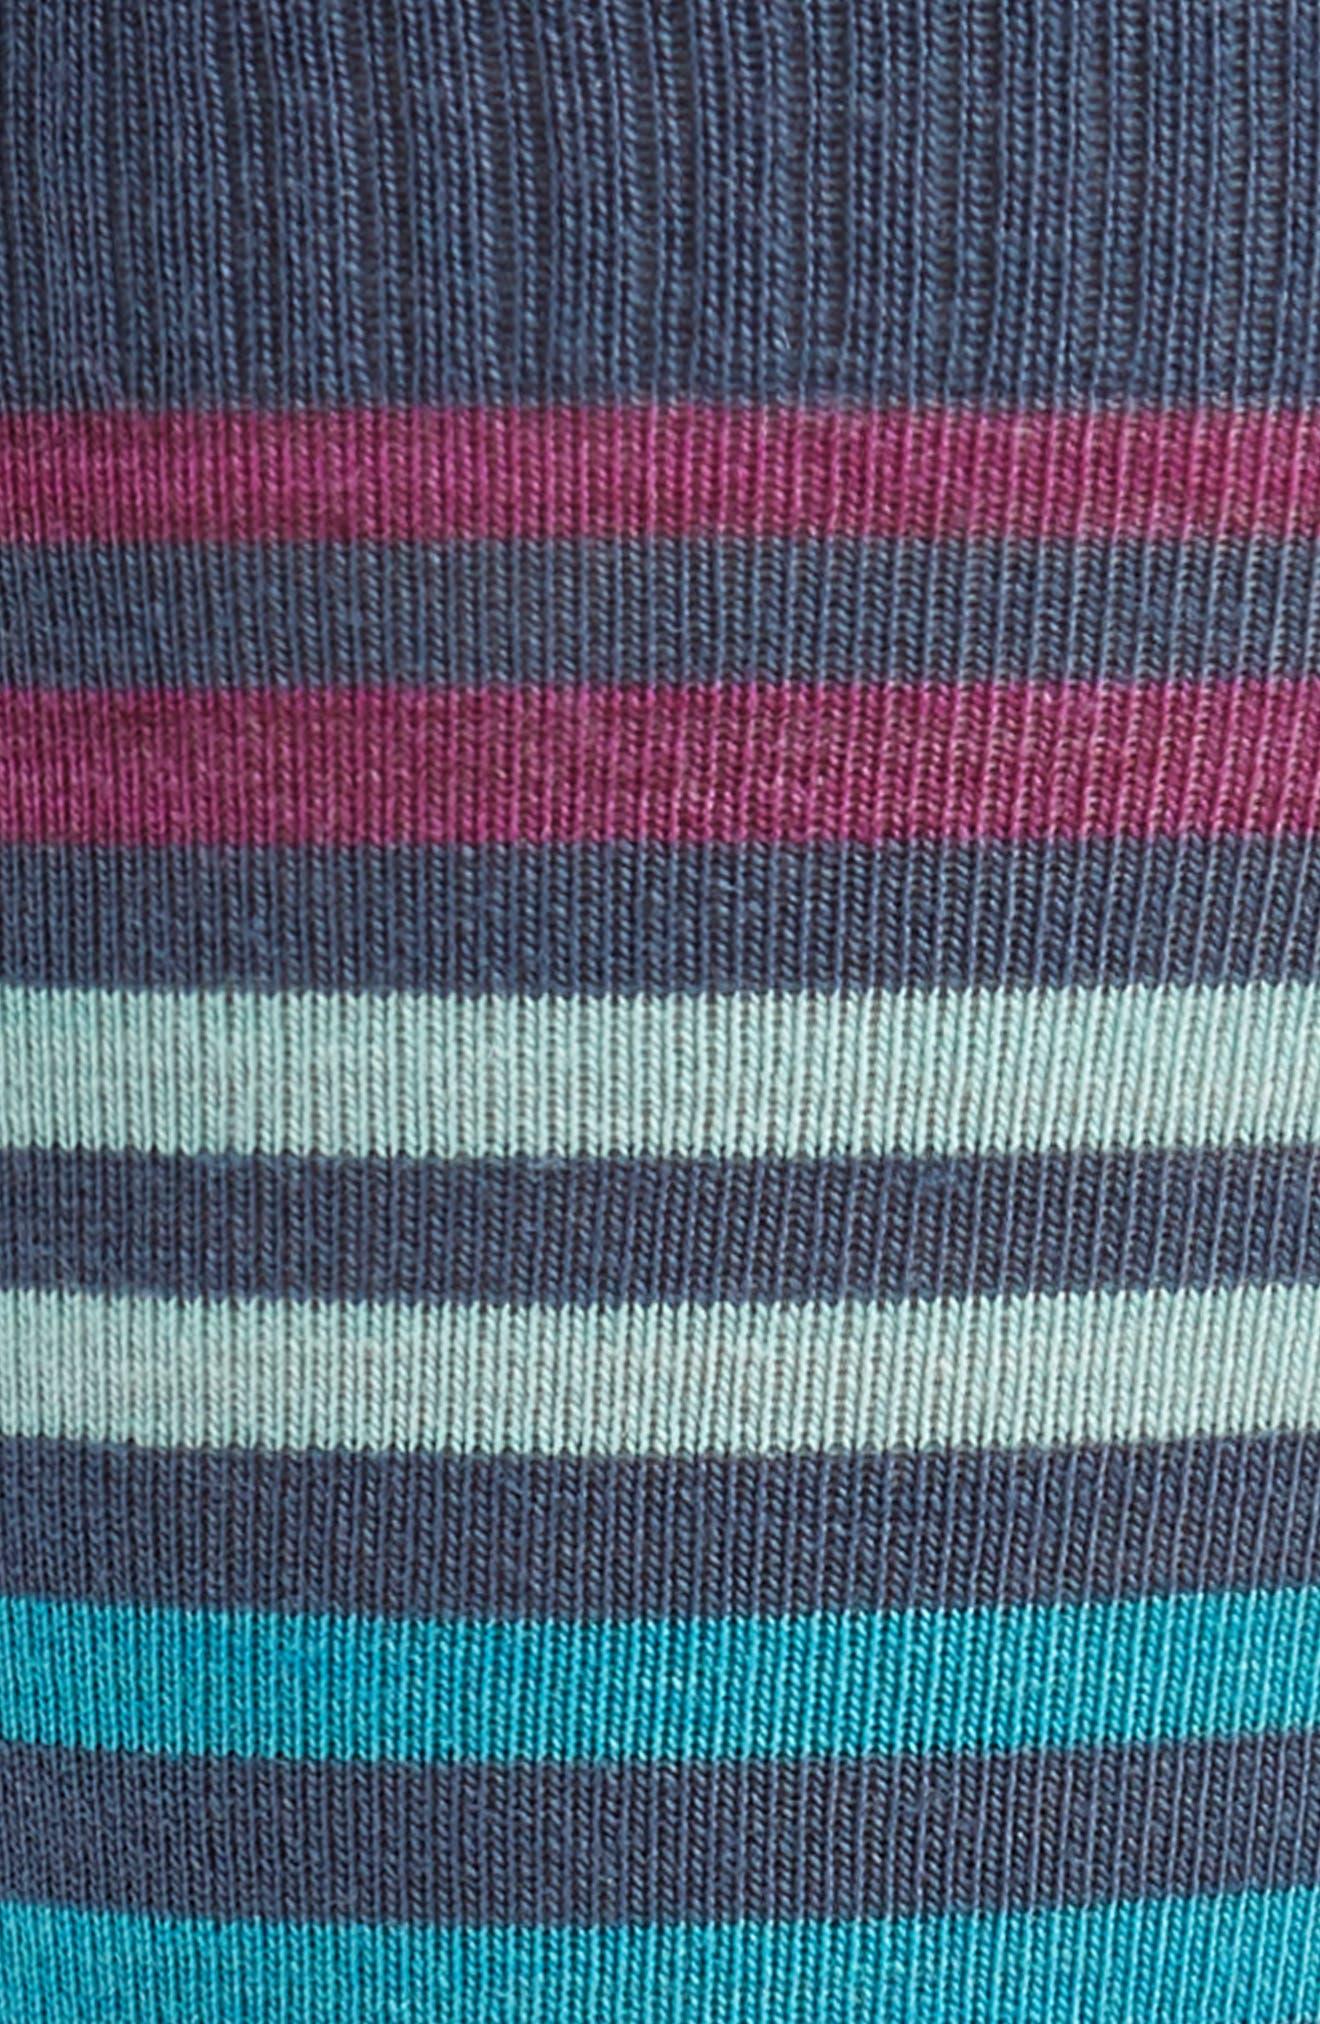 'Spruce Street' Stripe Merino Wool Blend Socks,                             Alternate thumbnail 2, color,                             DARK BLUE STEEL HEATHER